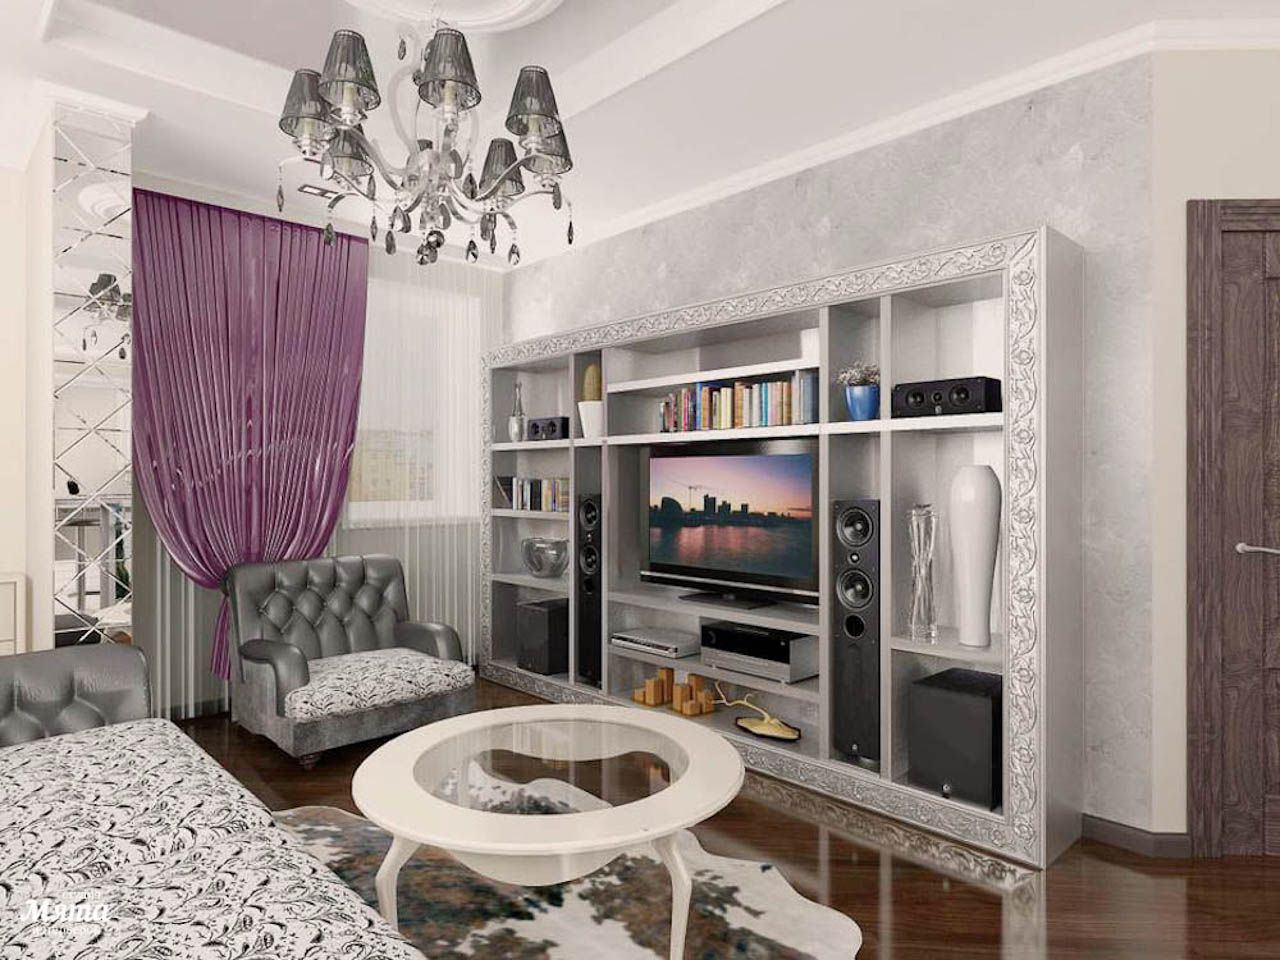 Дизайн интерьера двухкомнатной квартиры по ул. Юмашева 10 img908254631